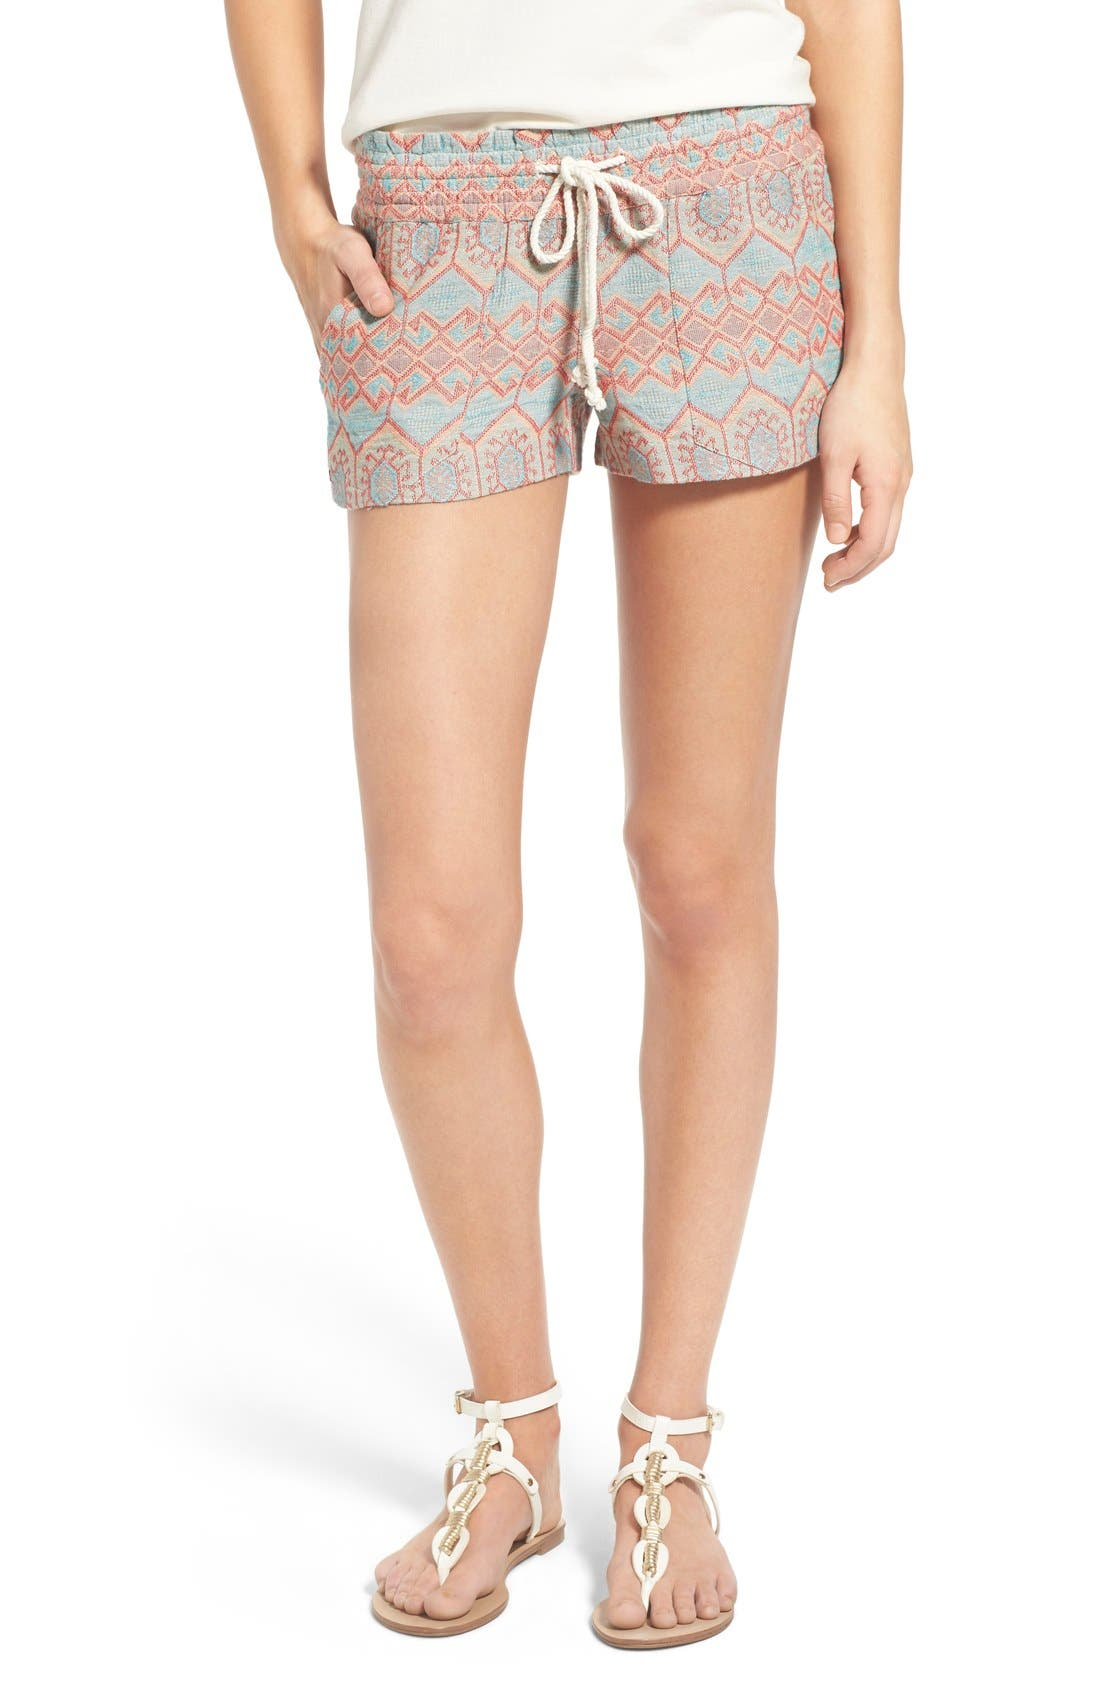 Alternate Image 1 Selected - Roxy 'Oceanside' Jacquard Shorts